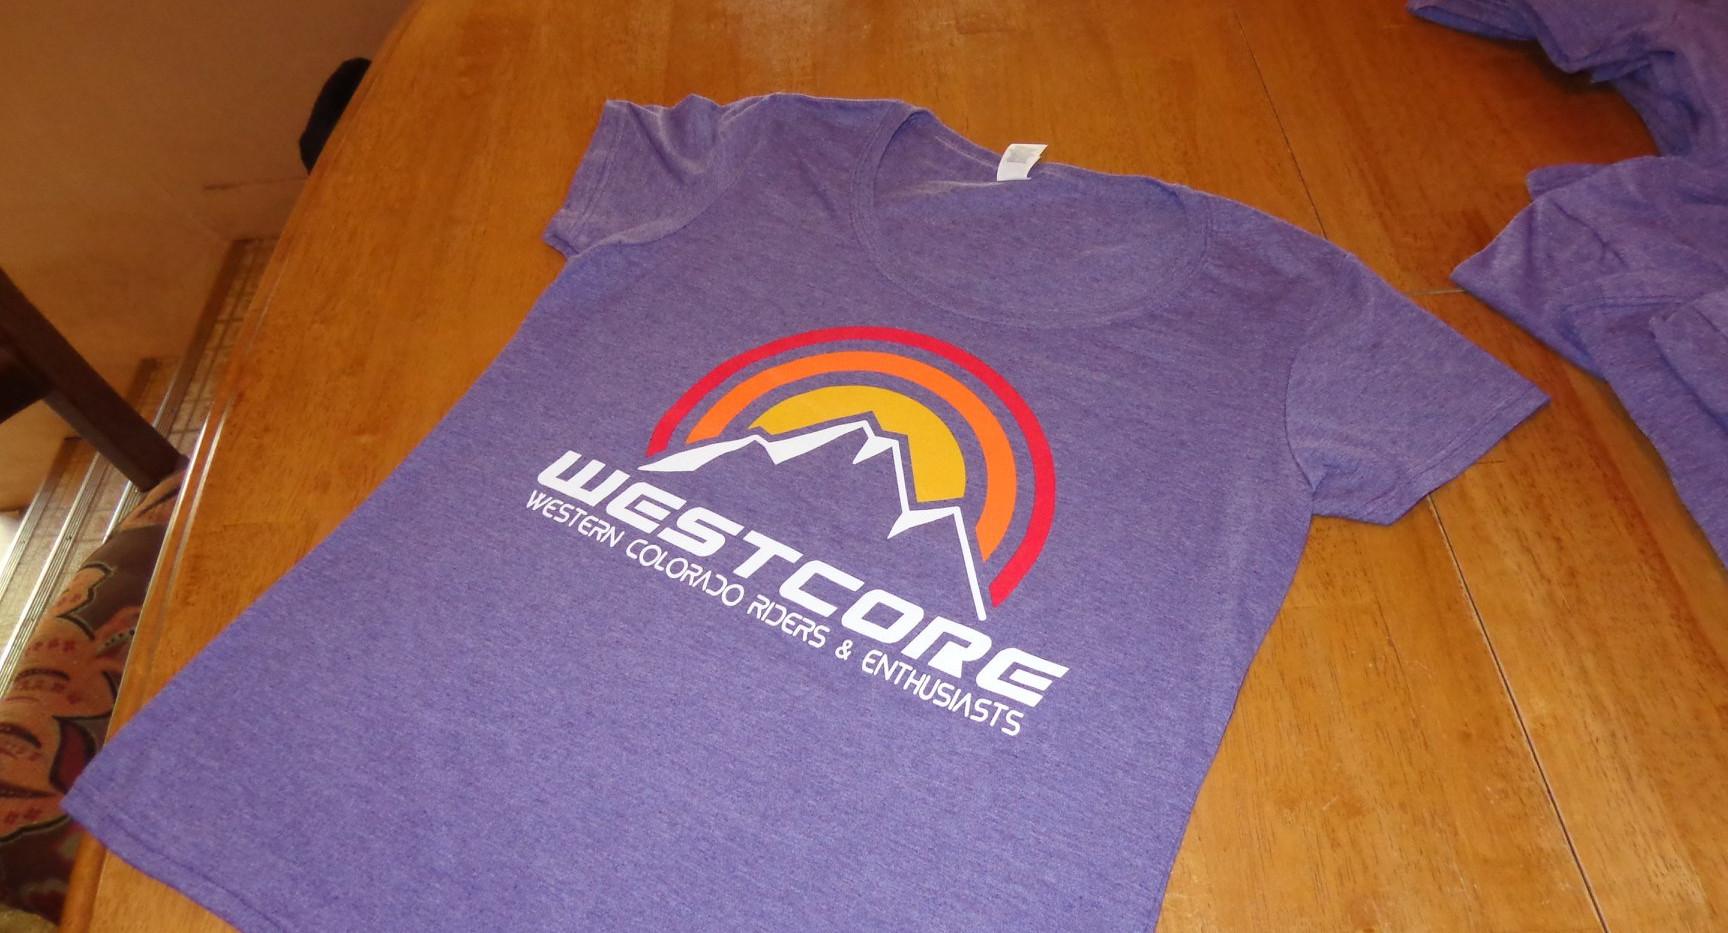 westcore shirt 2.jpg